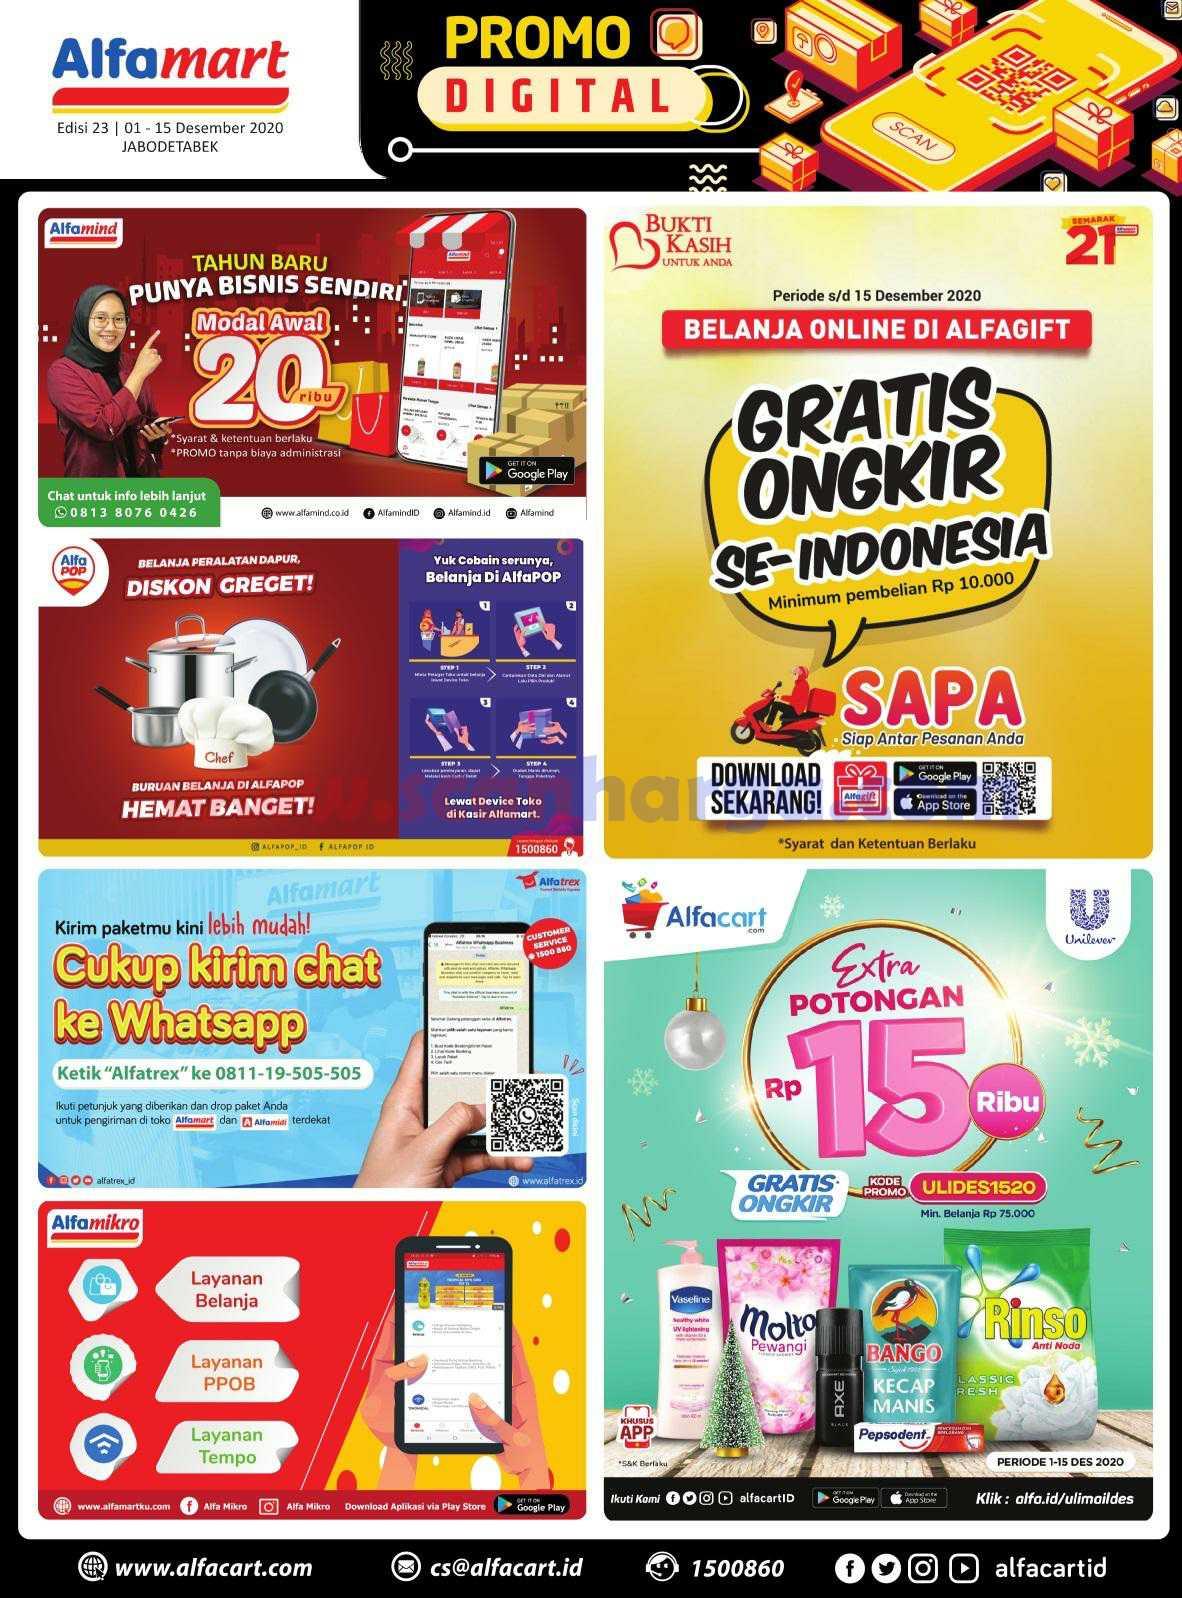 Katalog Promo Alfamart 1 - 15 Desember 2020 18